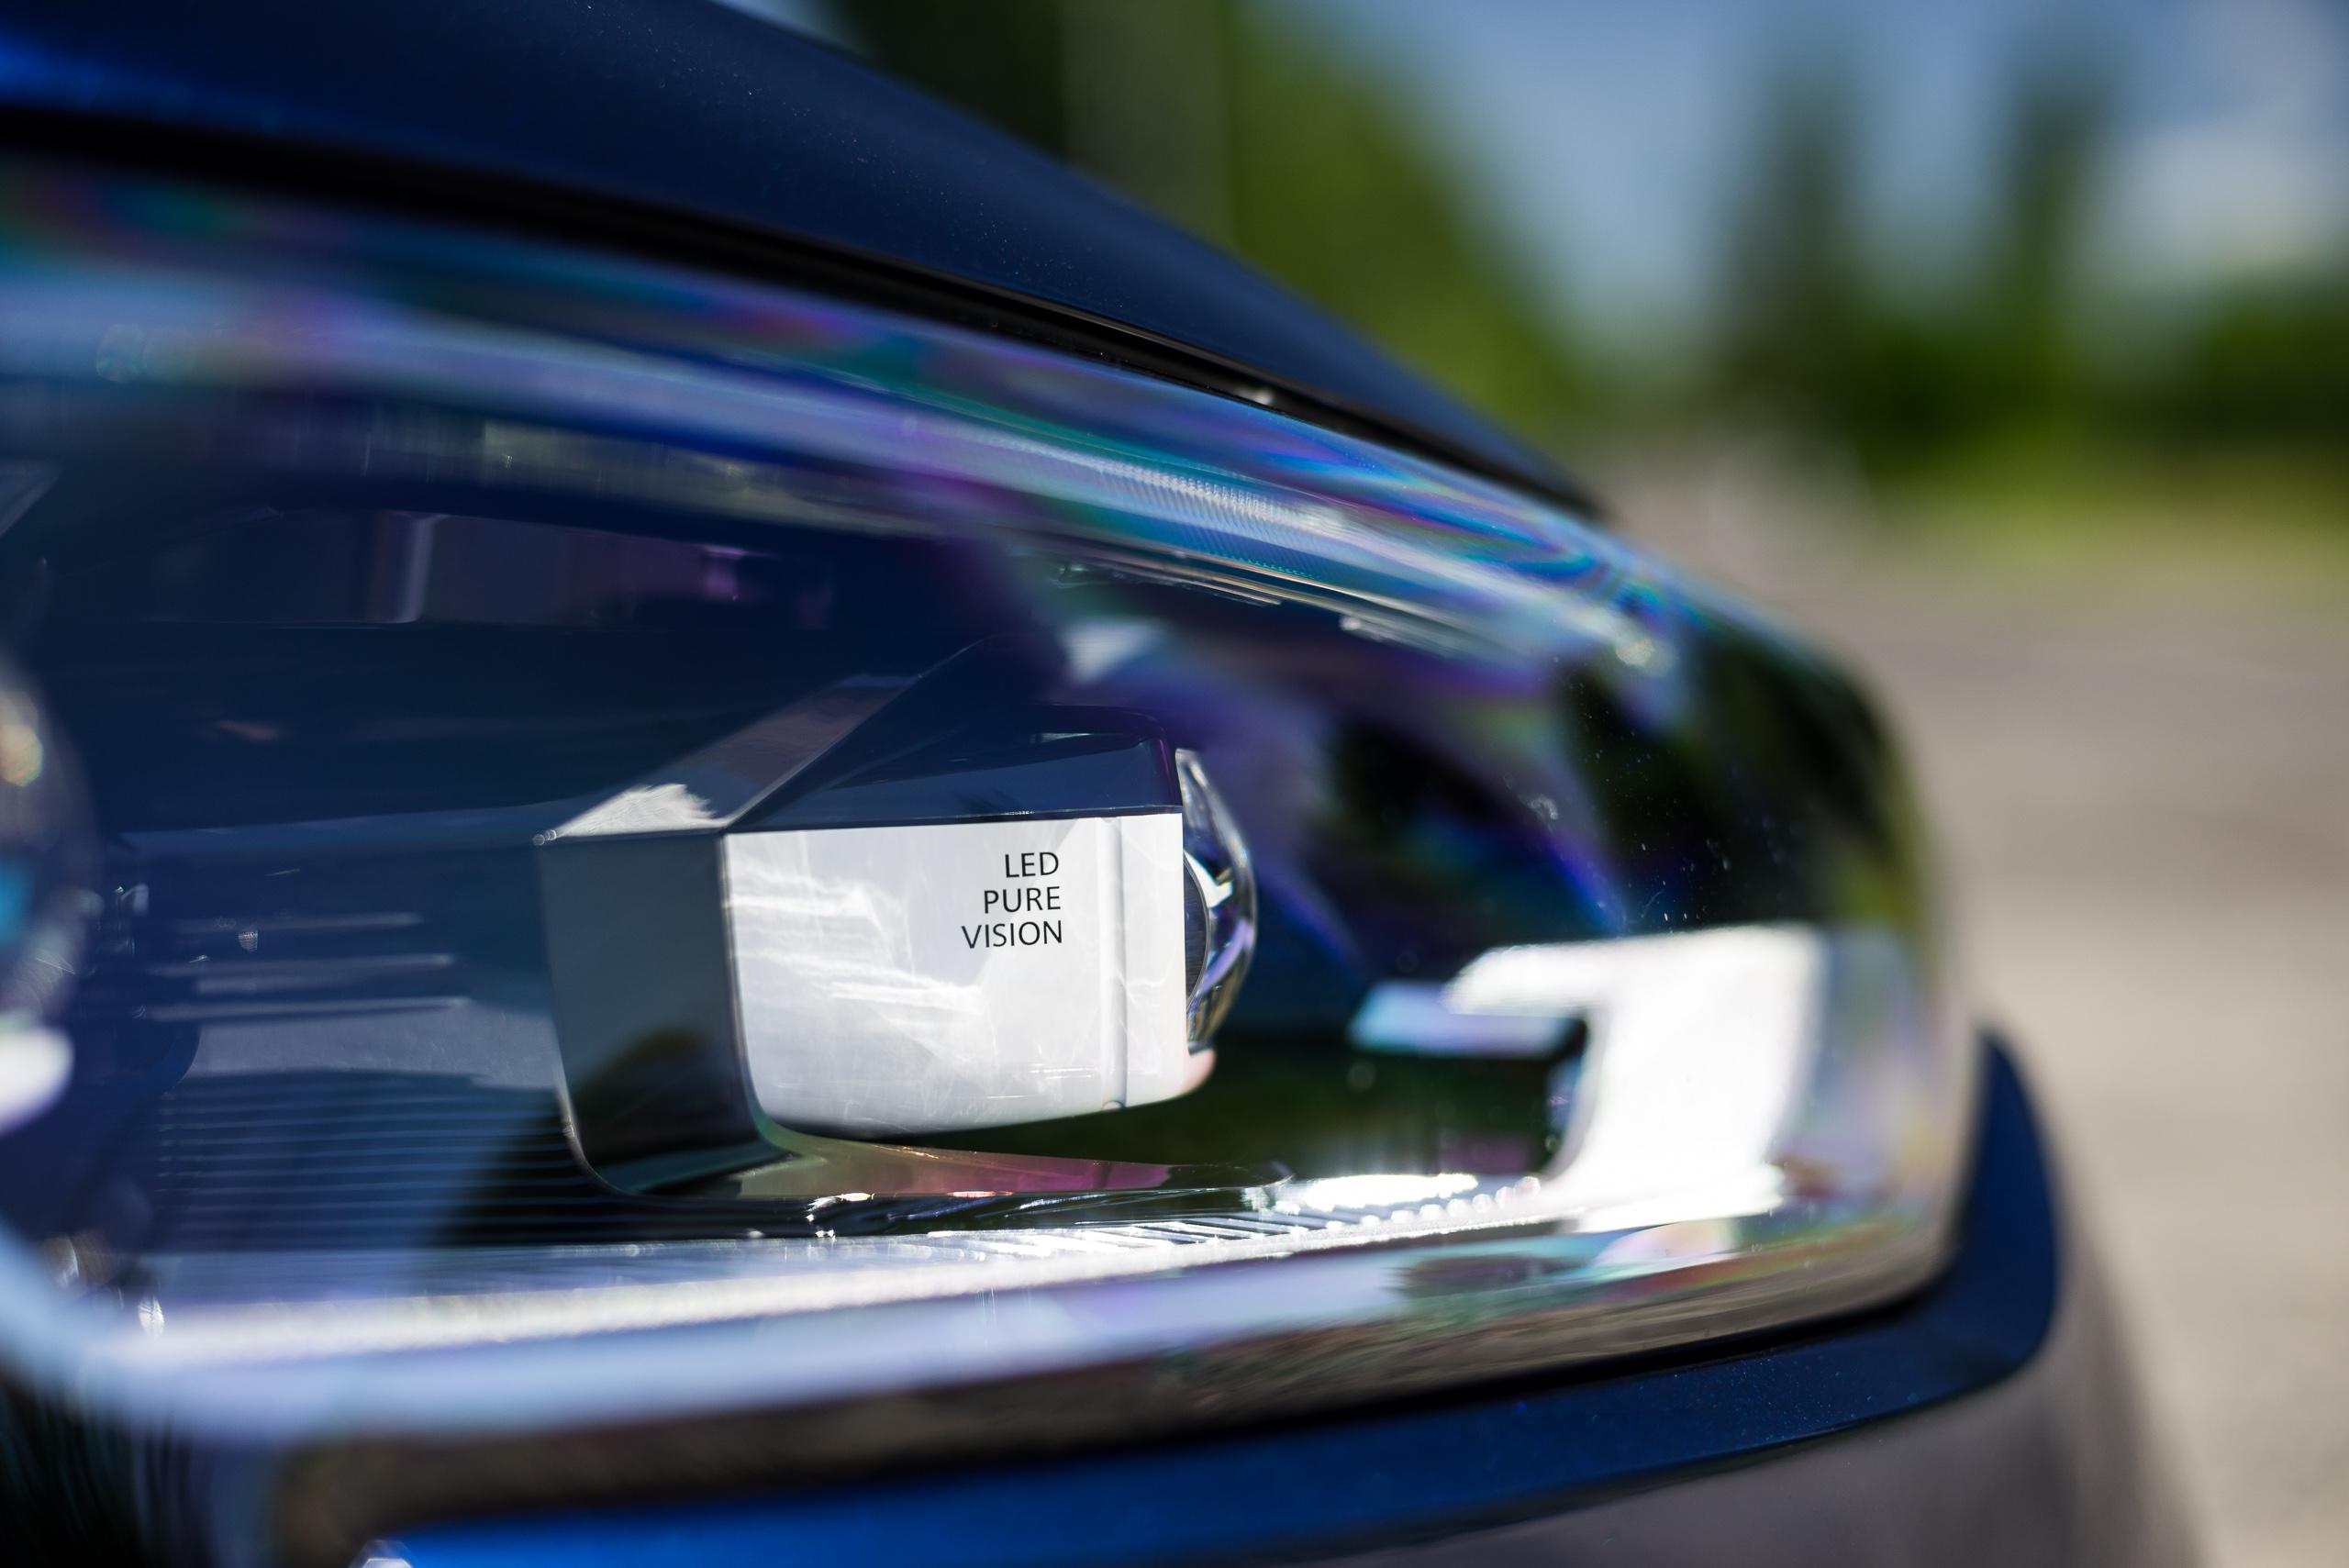 renault m gane energy tce 130 bose test project automotive. Black Bedroom Furniture Sets. Home Design Ideas